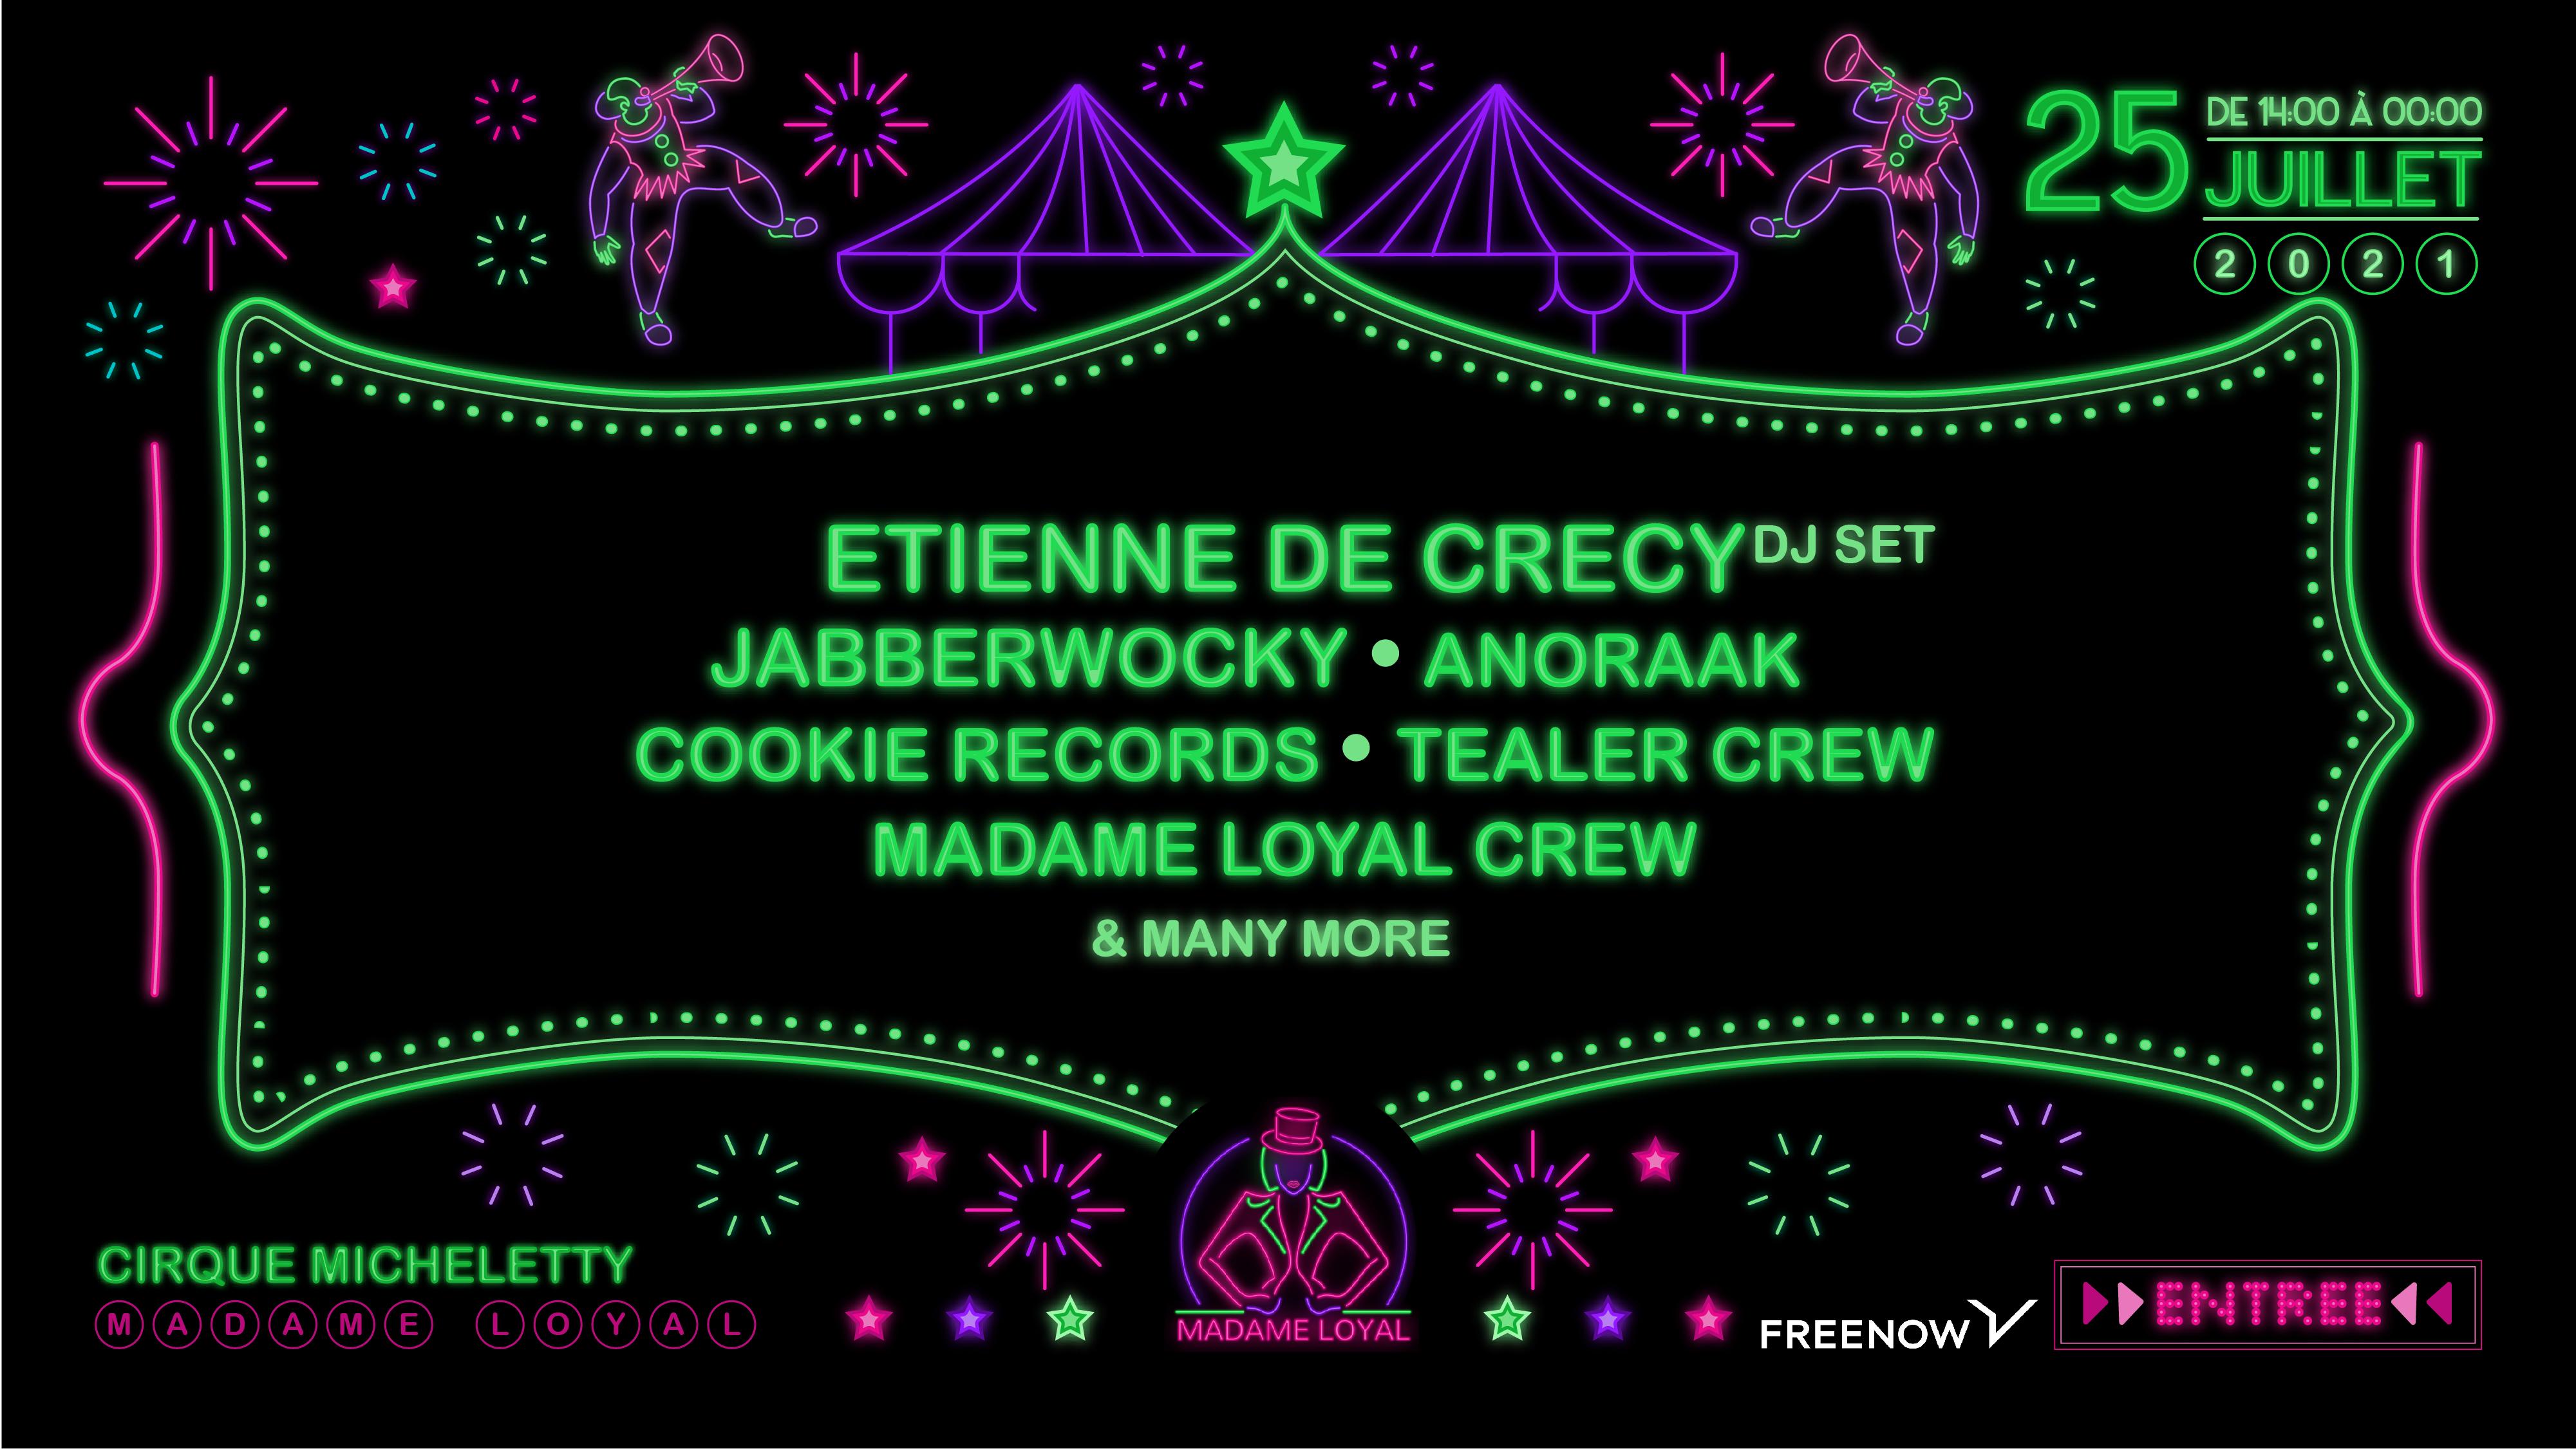 Madame Loyal : Etienne de Crecy, Jabberwocky, Anoraak & many more